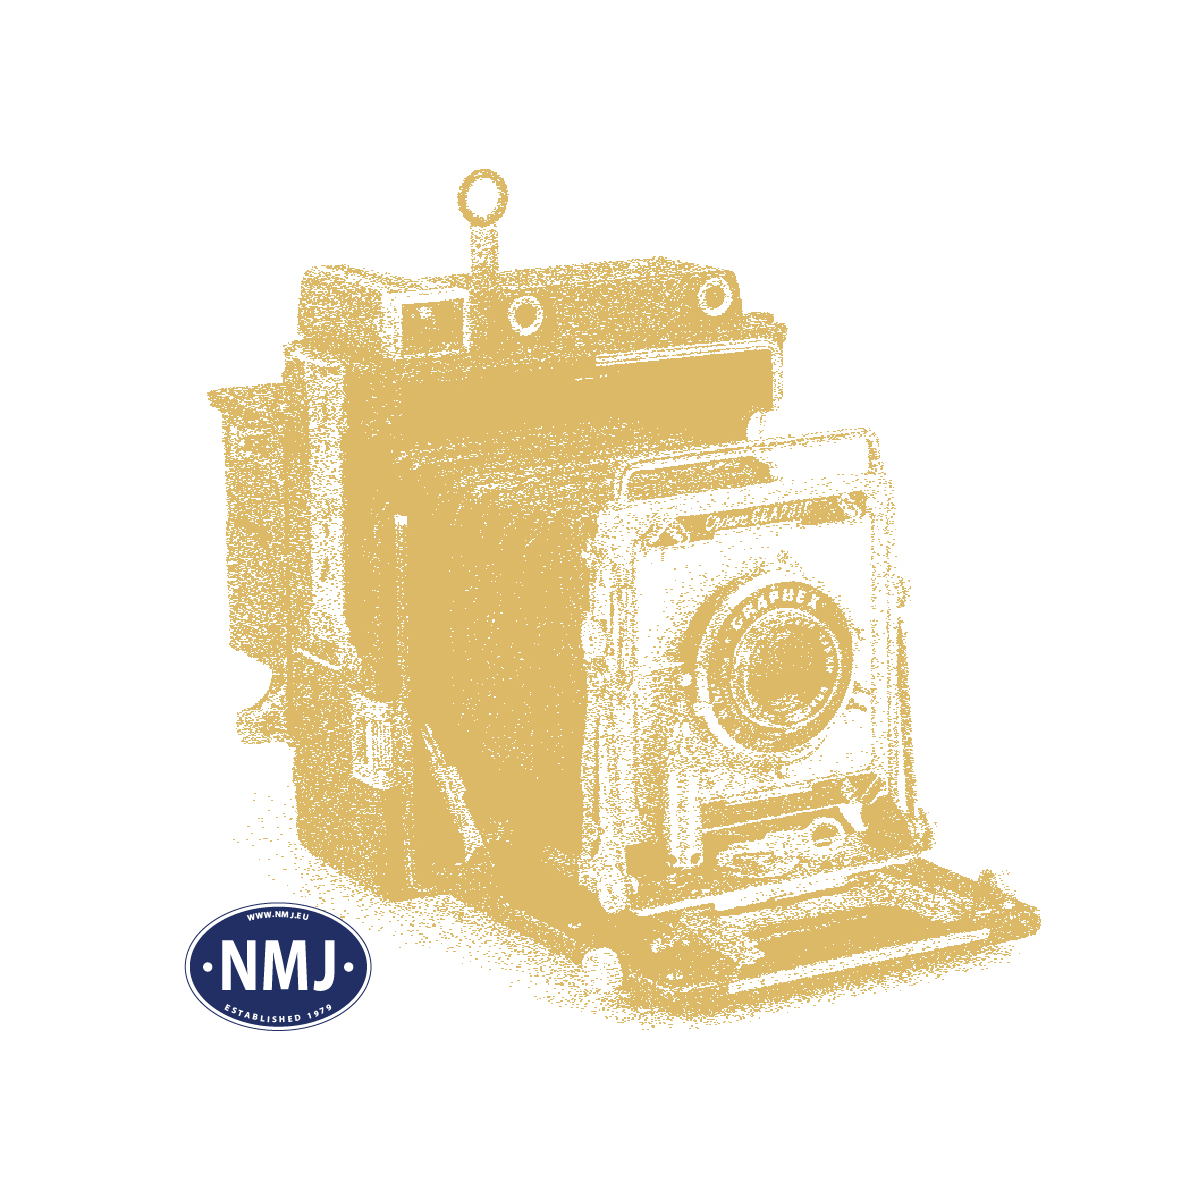 NMJS39.166 - NMJ Superline NSB Damplokomotiv Type 39.166